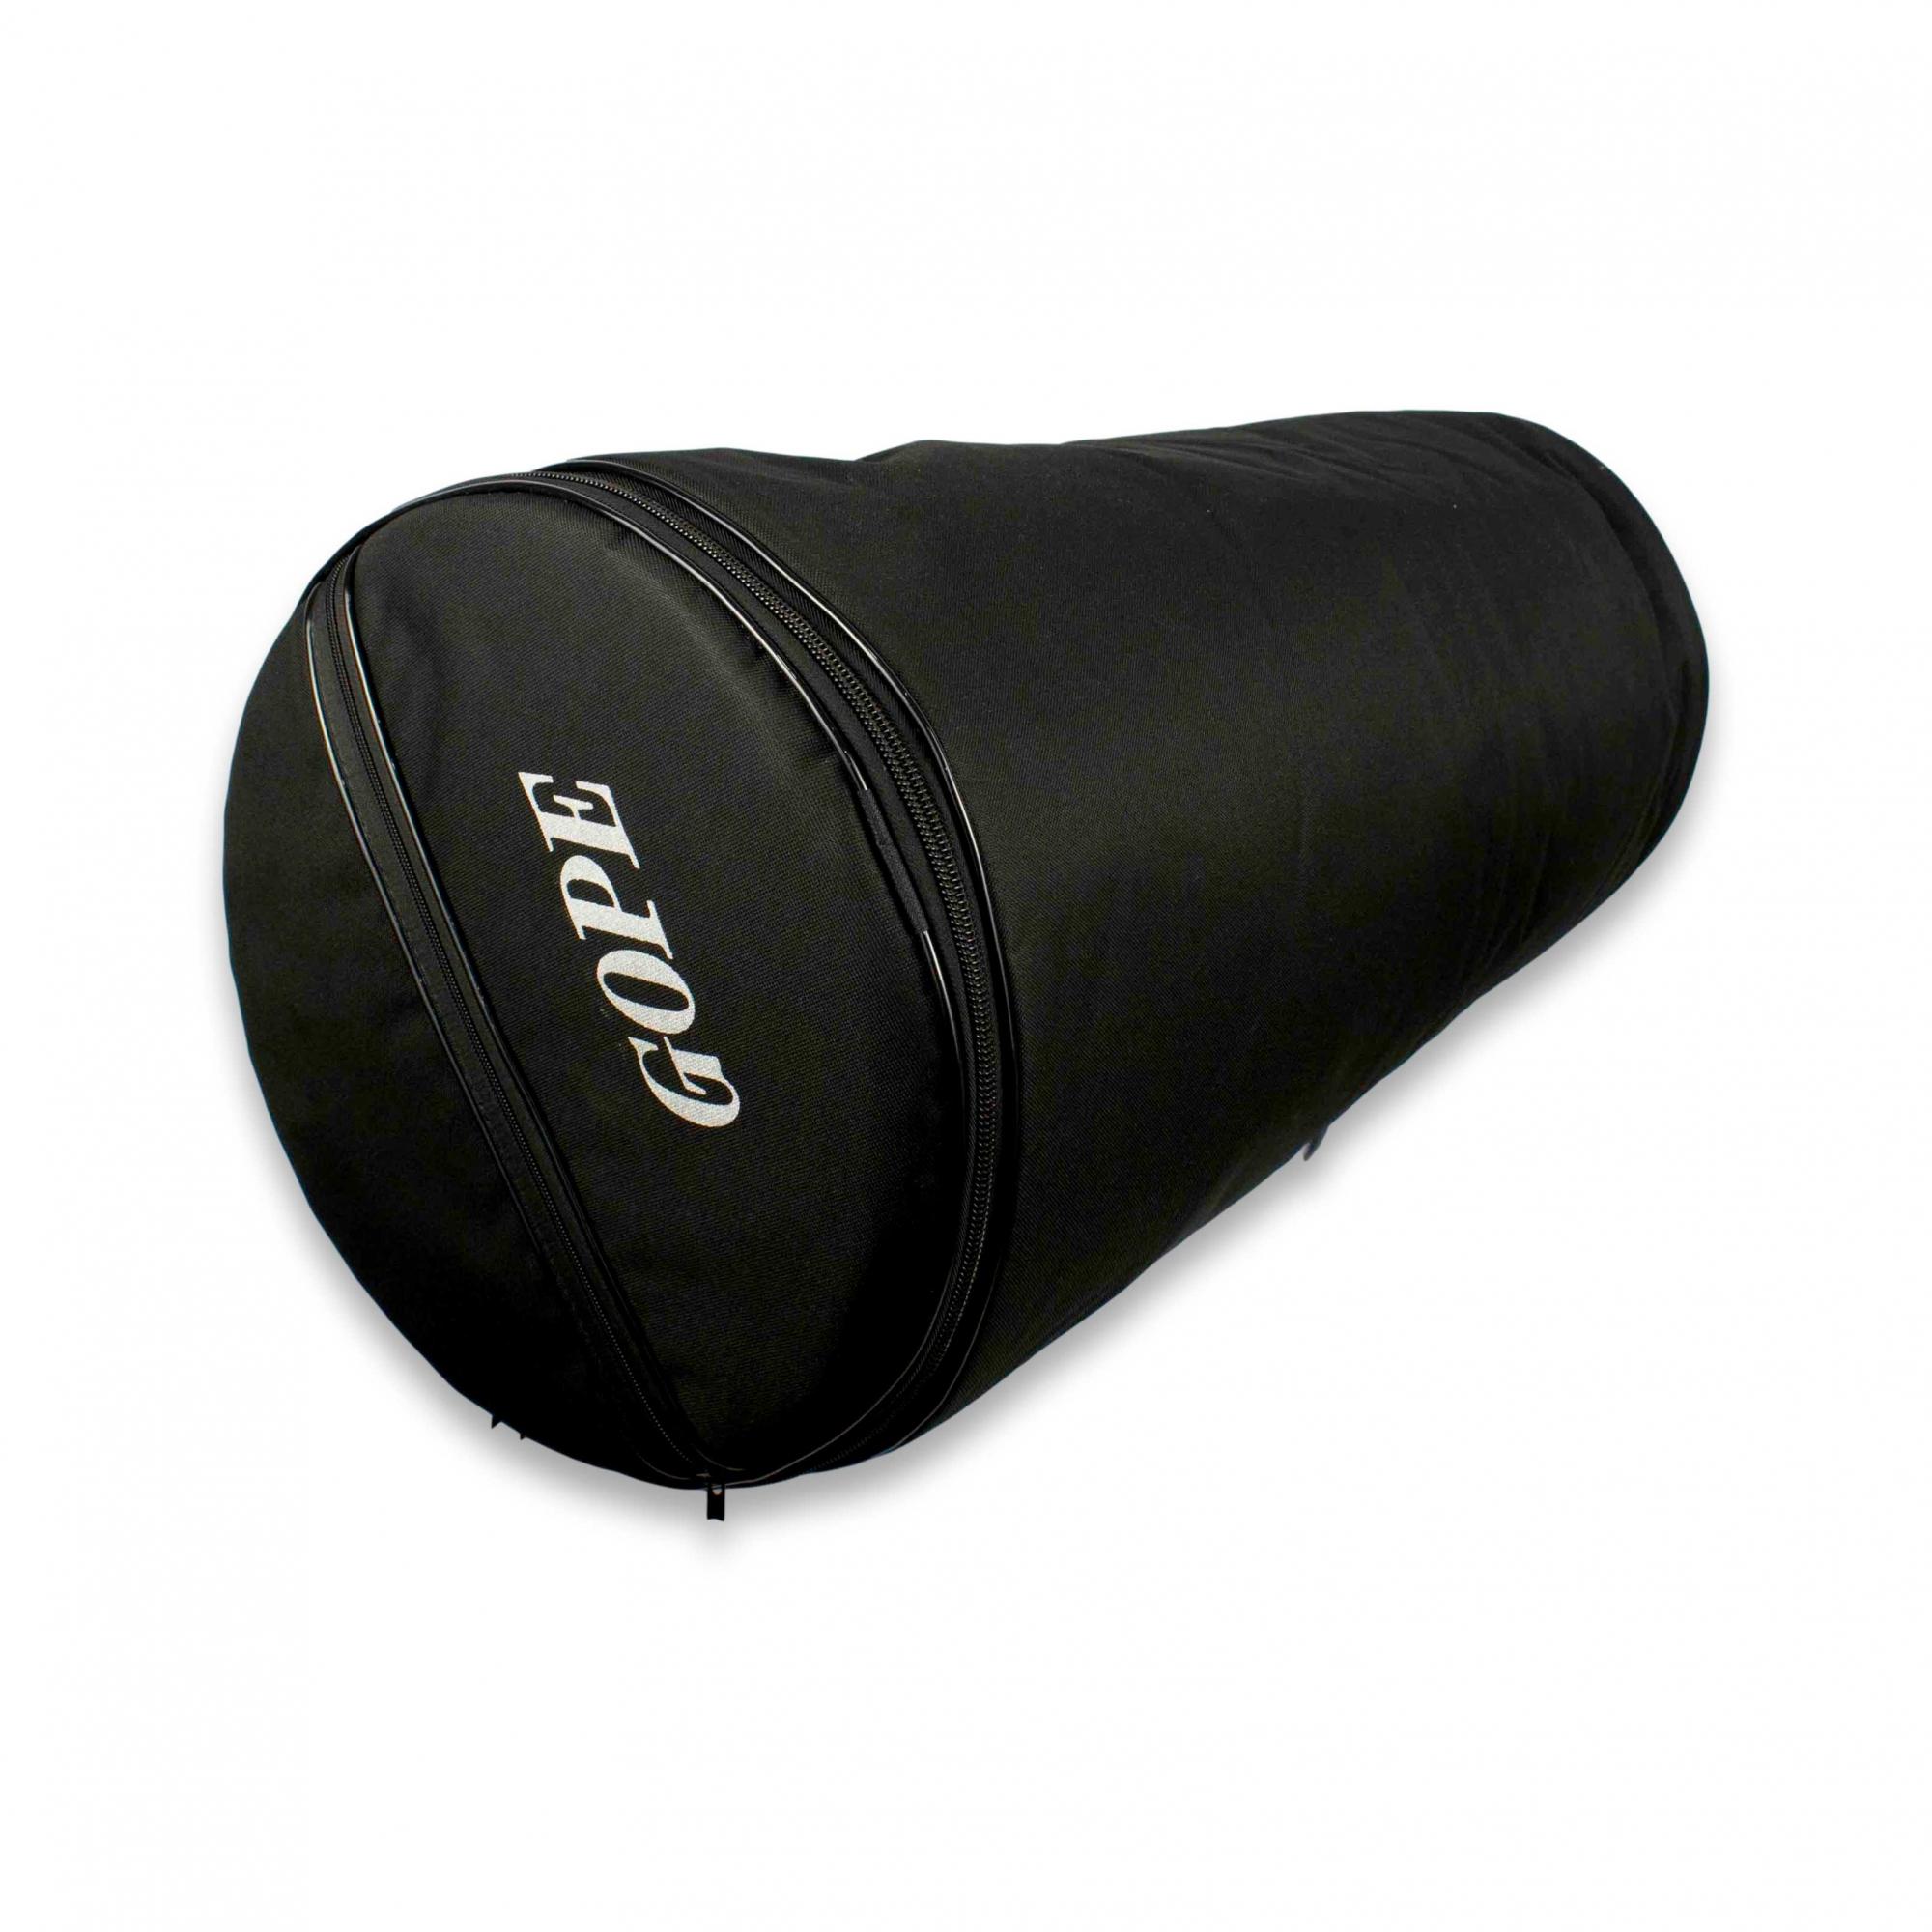 Capa Bag Gope p/ Rebolo Tantan Conico 12 Pol 65 Cm